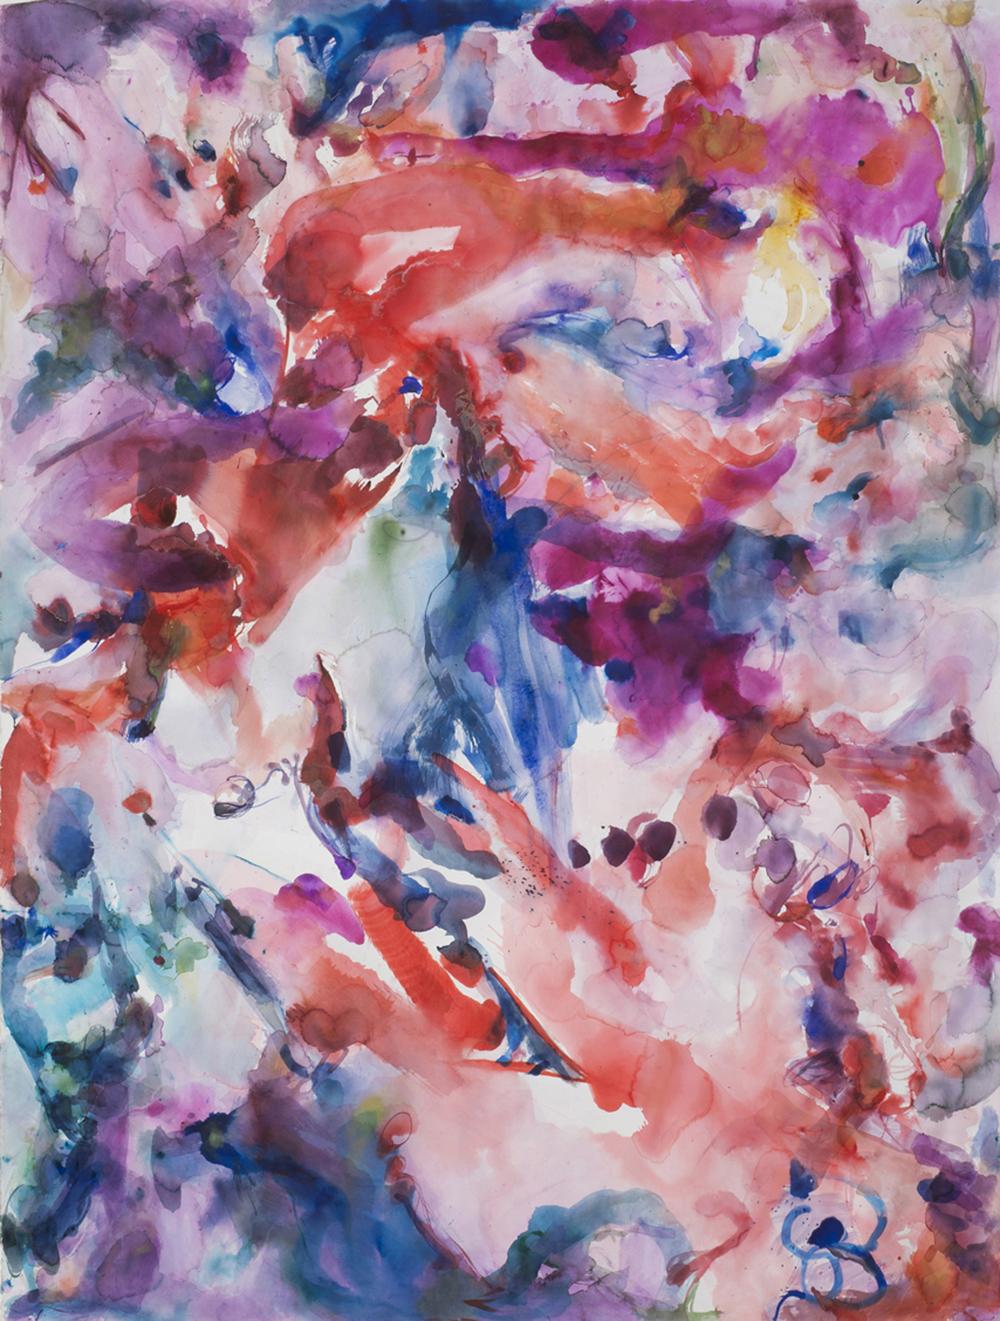 "Reef - Peachy. Watercolor, lapis lazuli, murex, African lipstick. 52"" w x 68"" h"